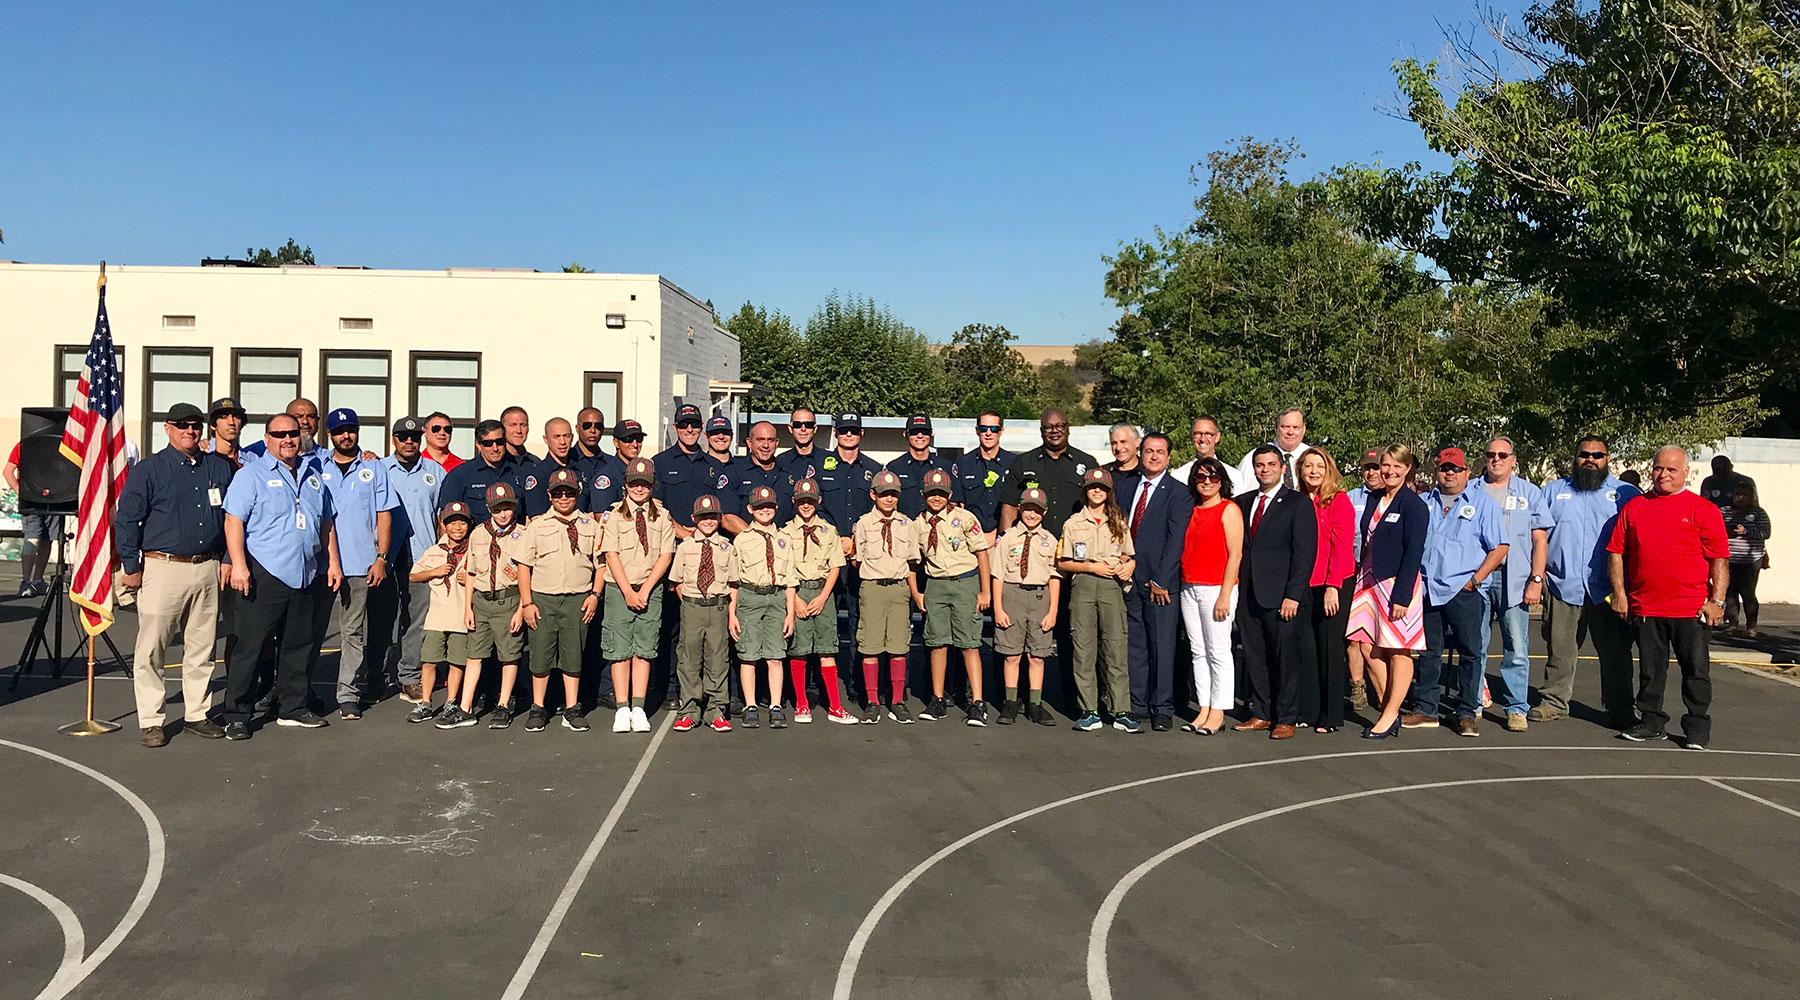 Glenoaks Elementary School Firefighters Celebration